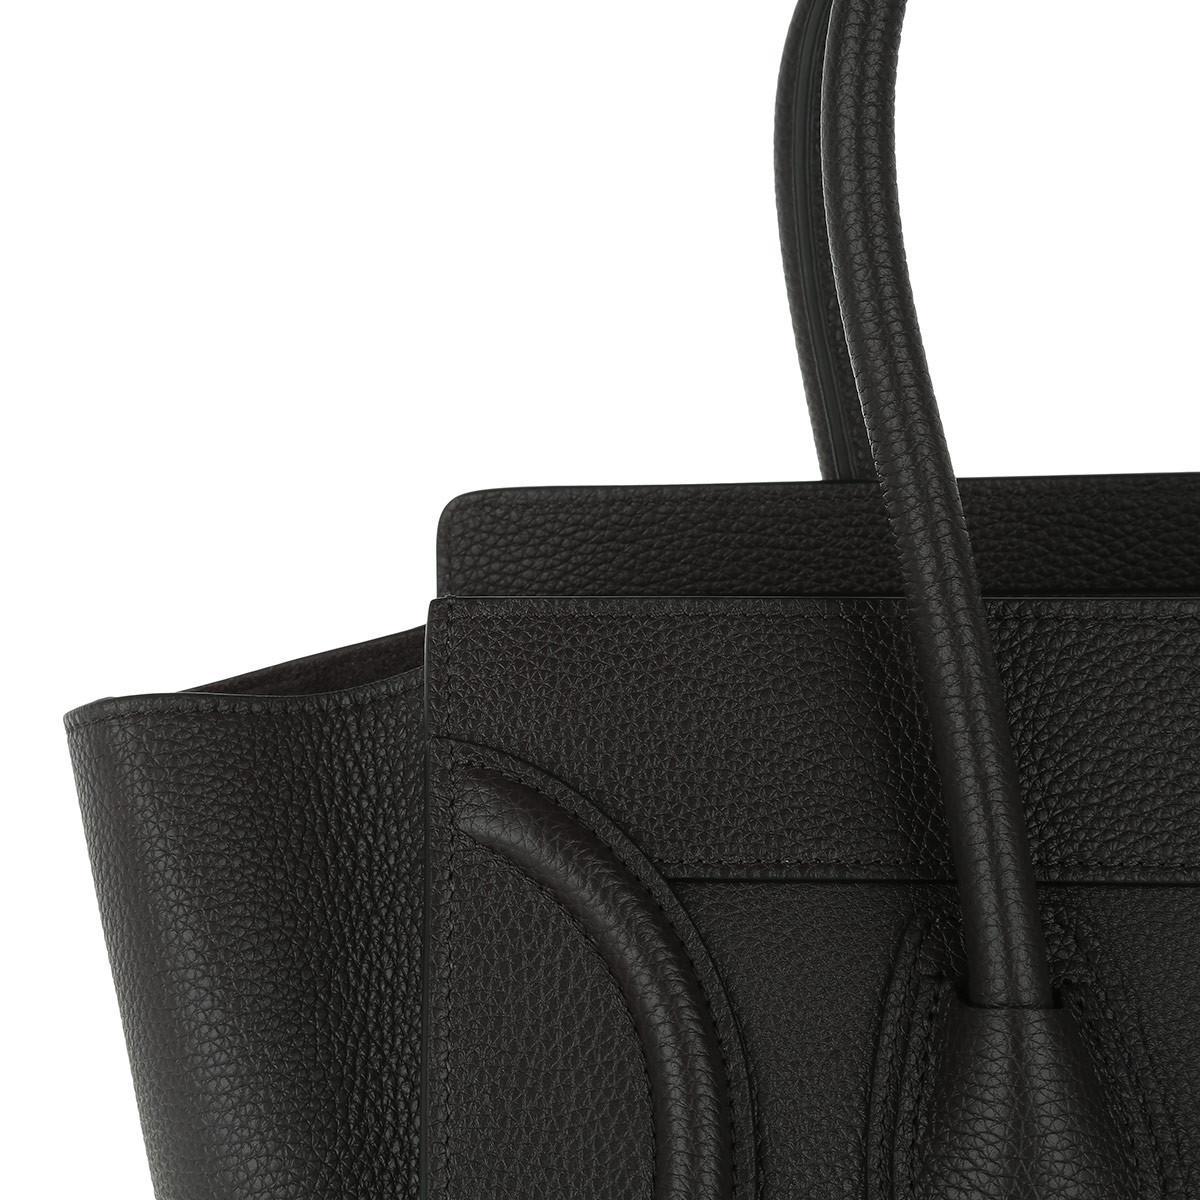 35bca547449 Céline Micro Luggage Calfskin Tote Liquorice in Black - Lyst